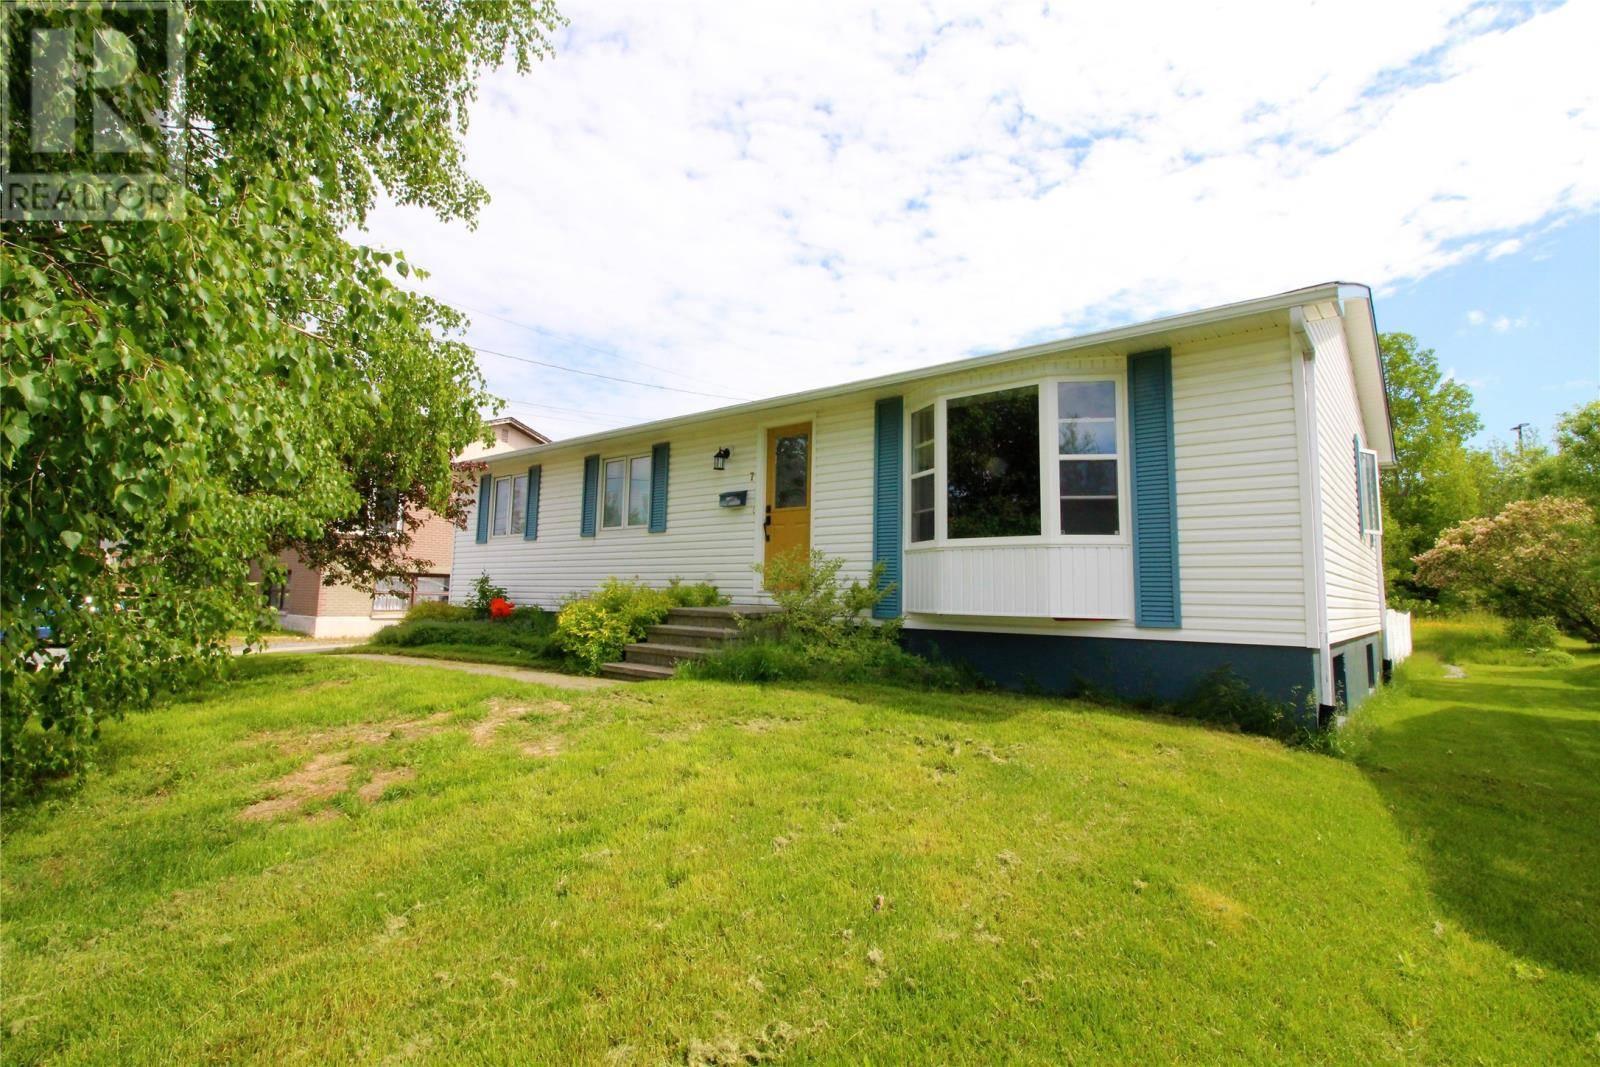 House for sale at 7 Westview Ave Corner Brook Newfoundland - MLS: 1199421